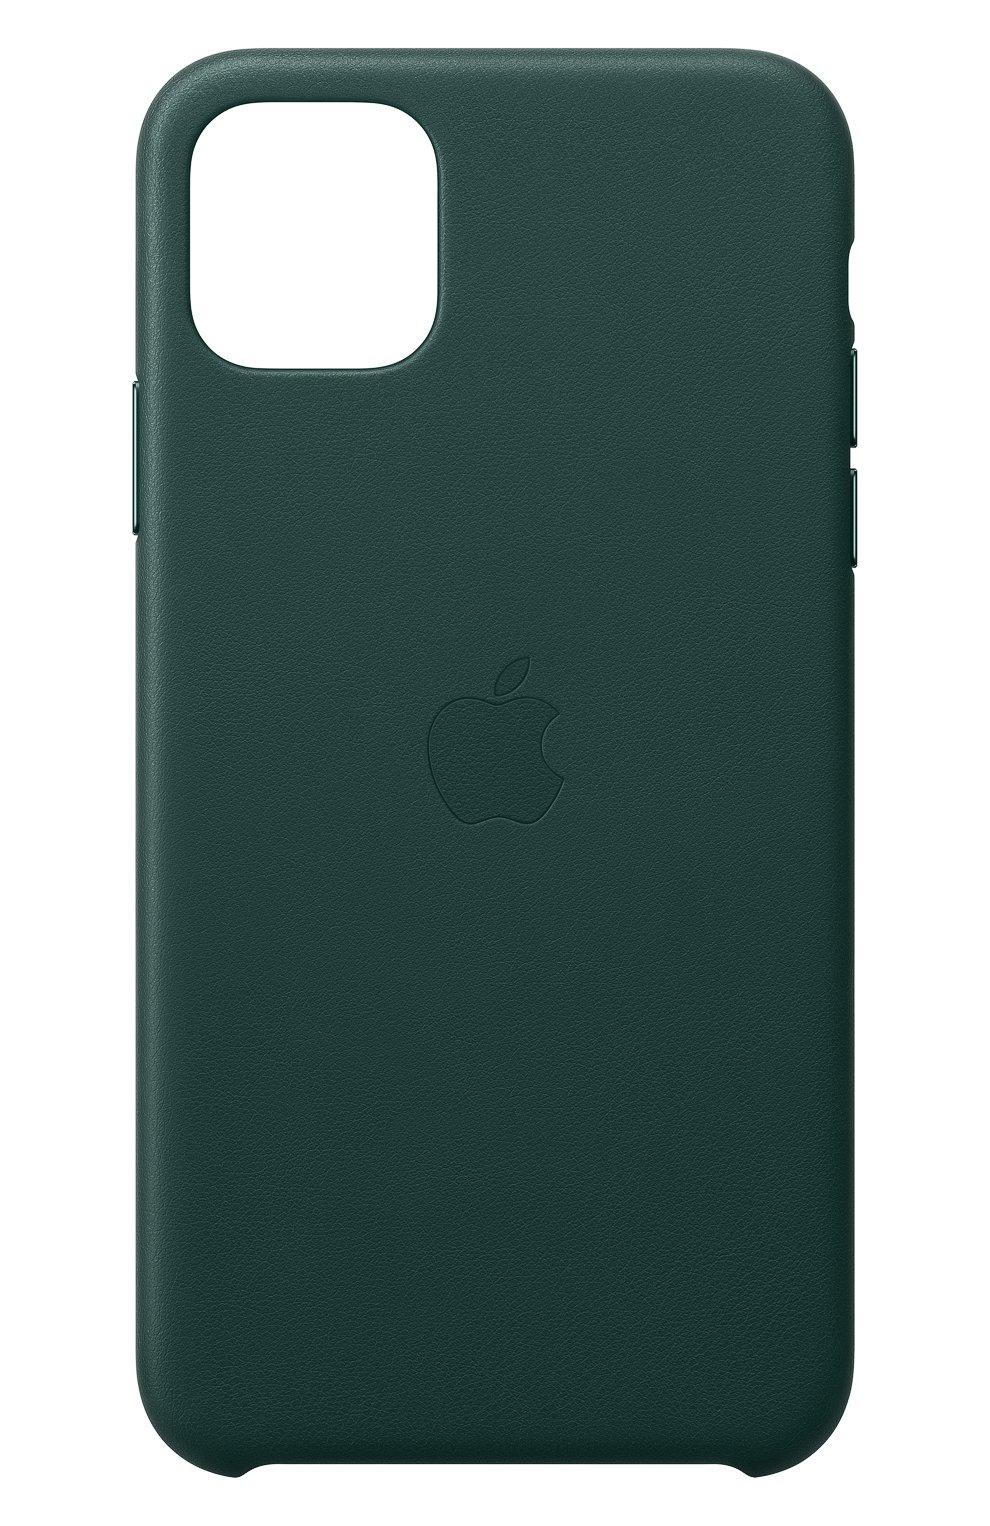 Кожаный чехол для iphone 11 pro max APPLE  темно-зеленого цвета, арт. MX0C2ZM/A | Фото 1